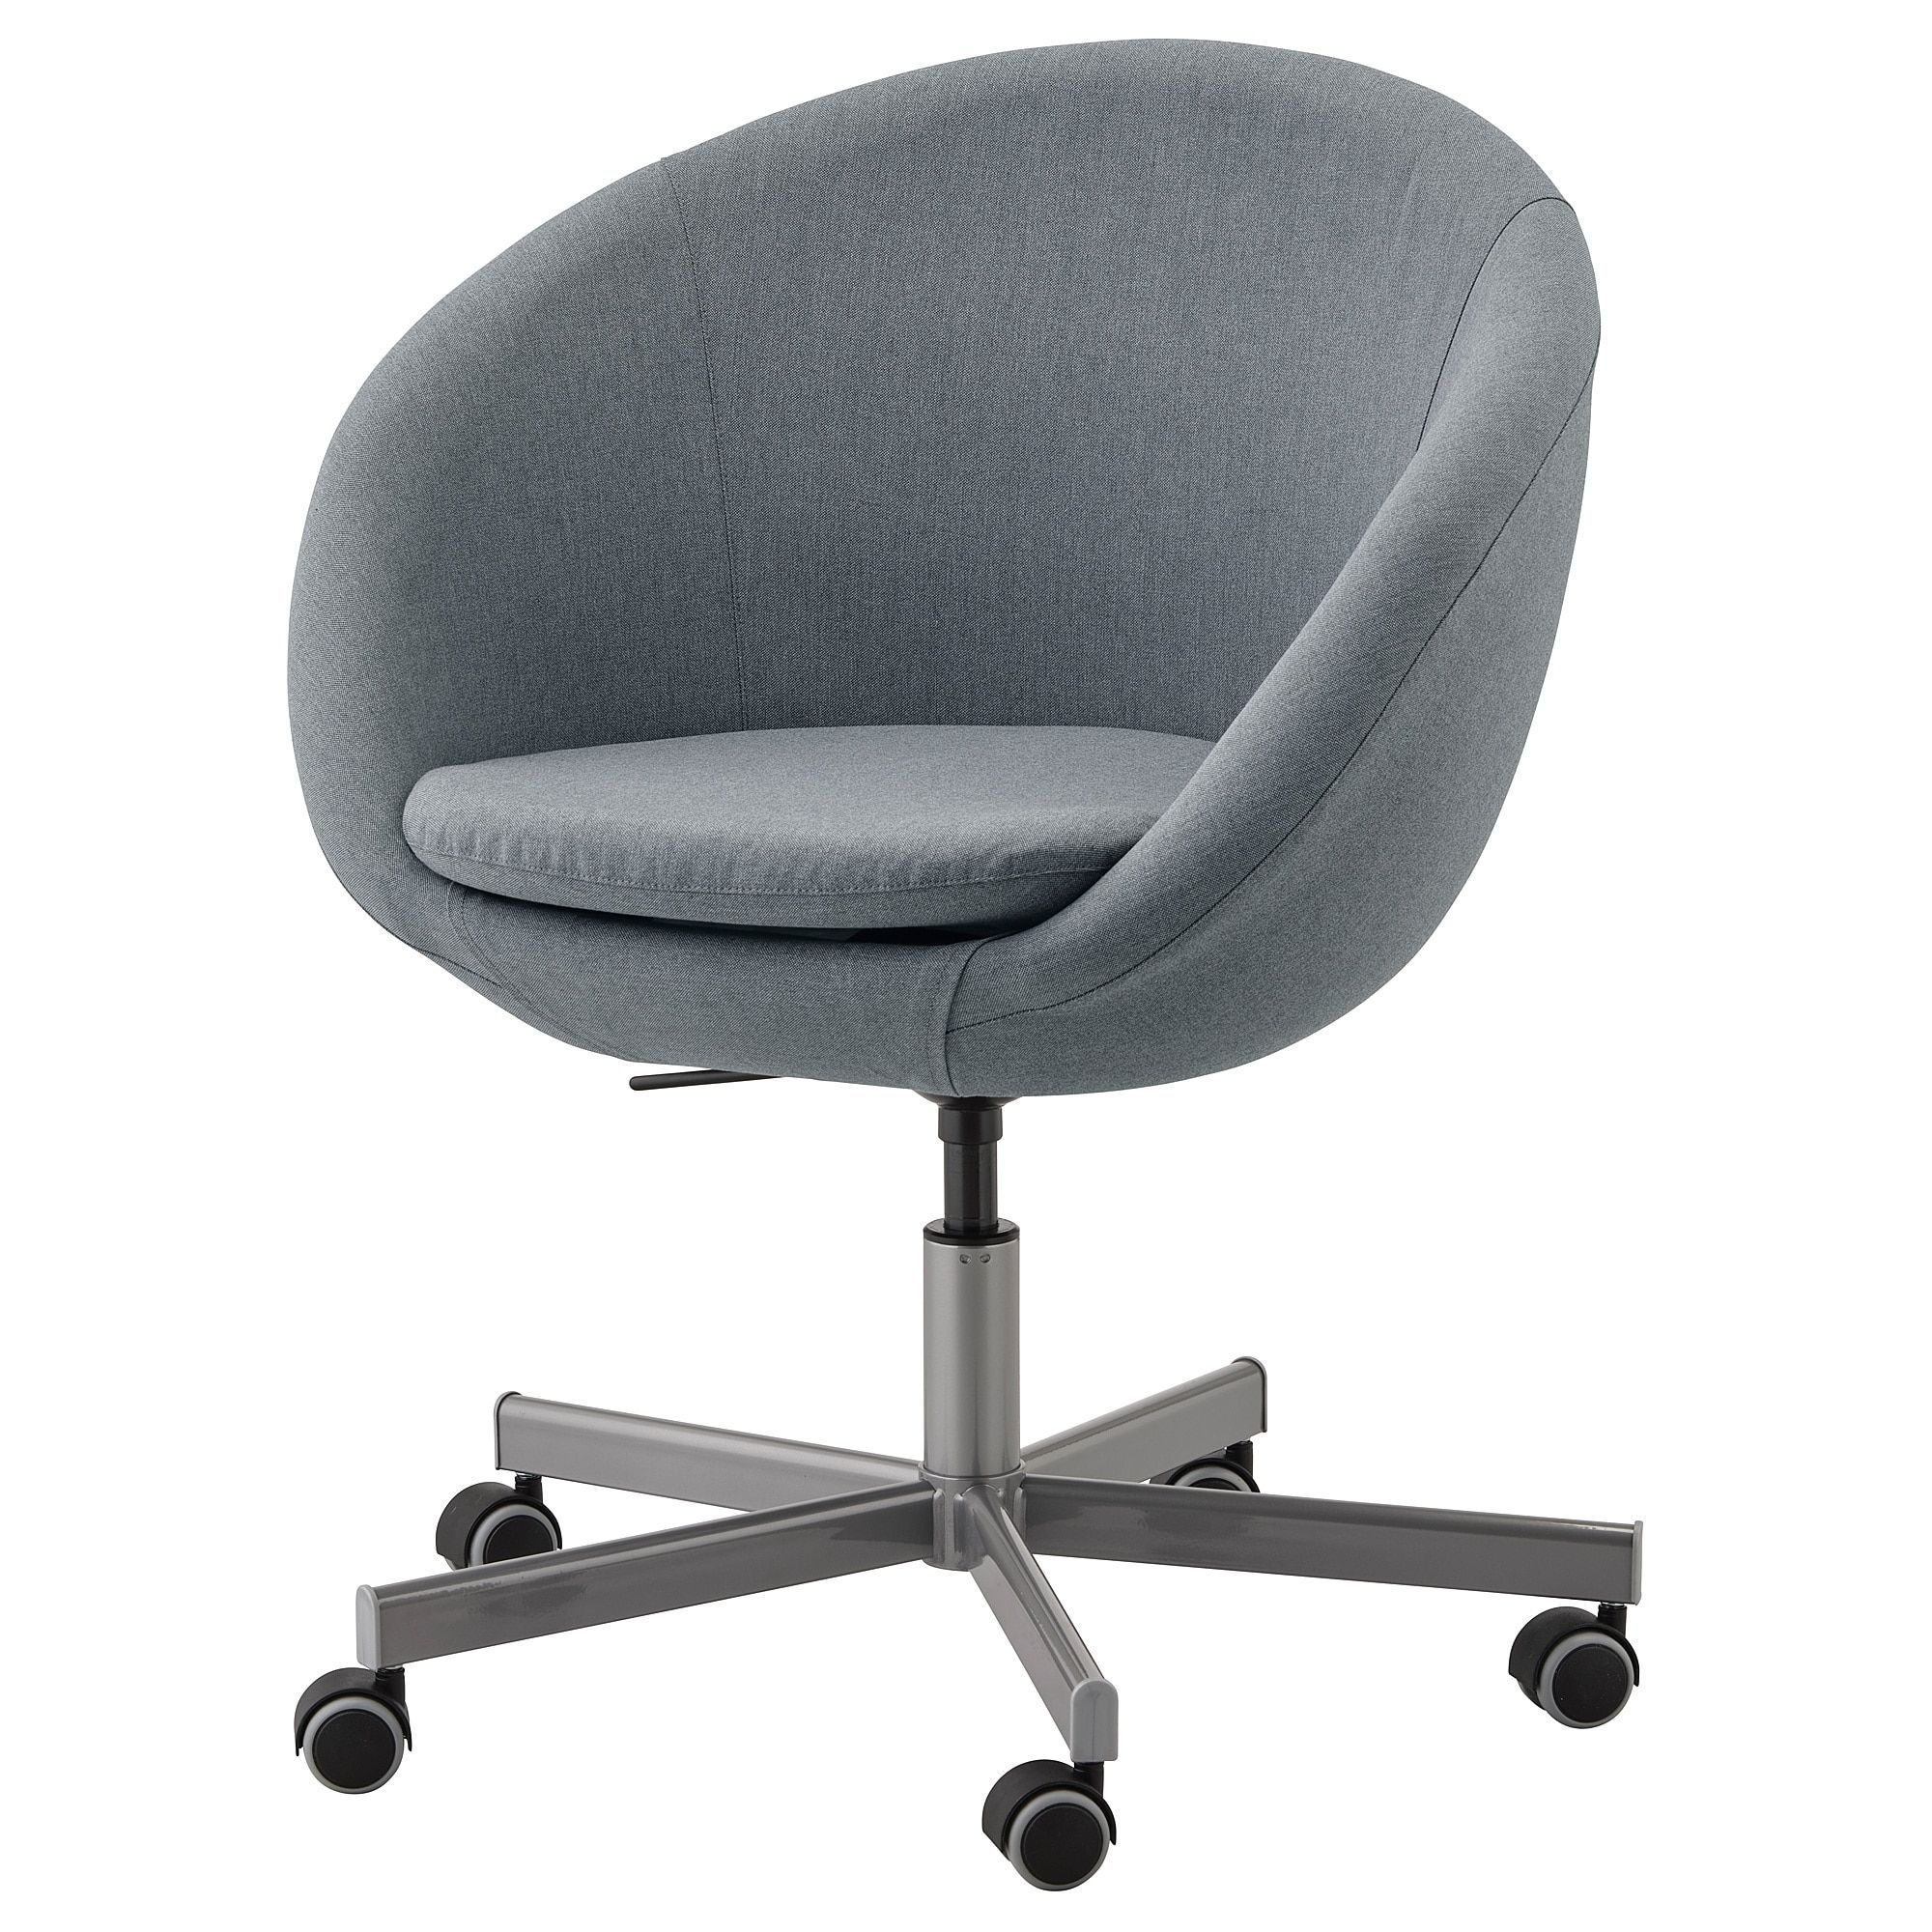 Skruvsta Swivel Chair Vissle Gray Ikea Chaises Pivotantes Chaise Ikea Chaise